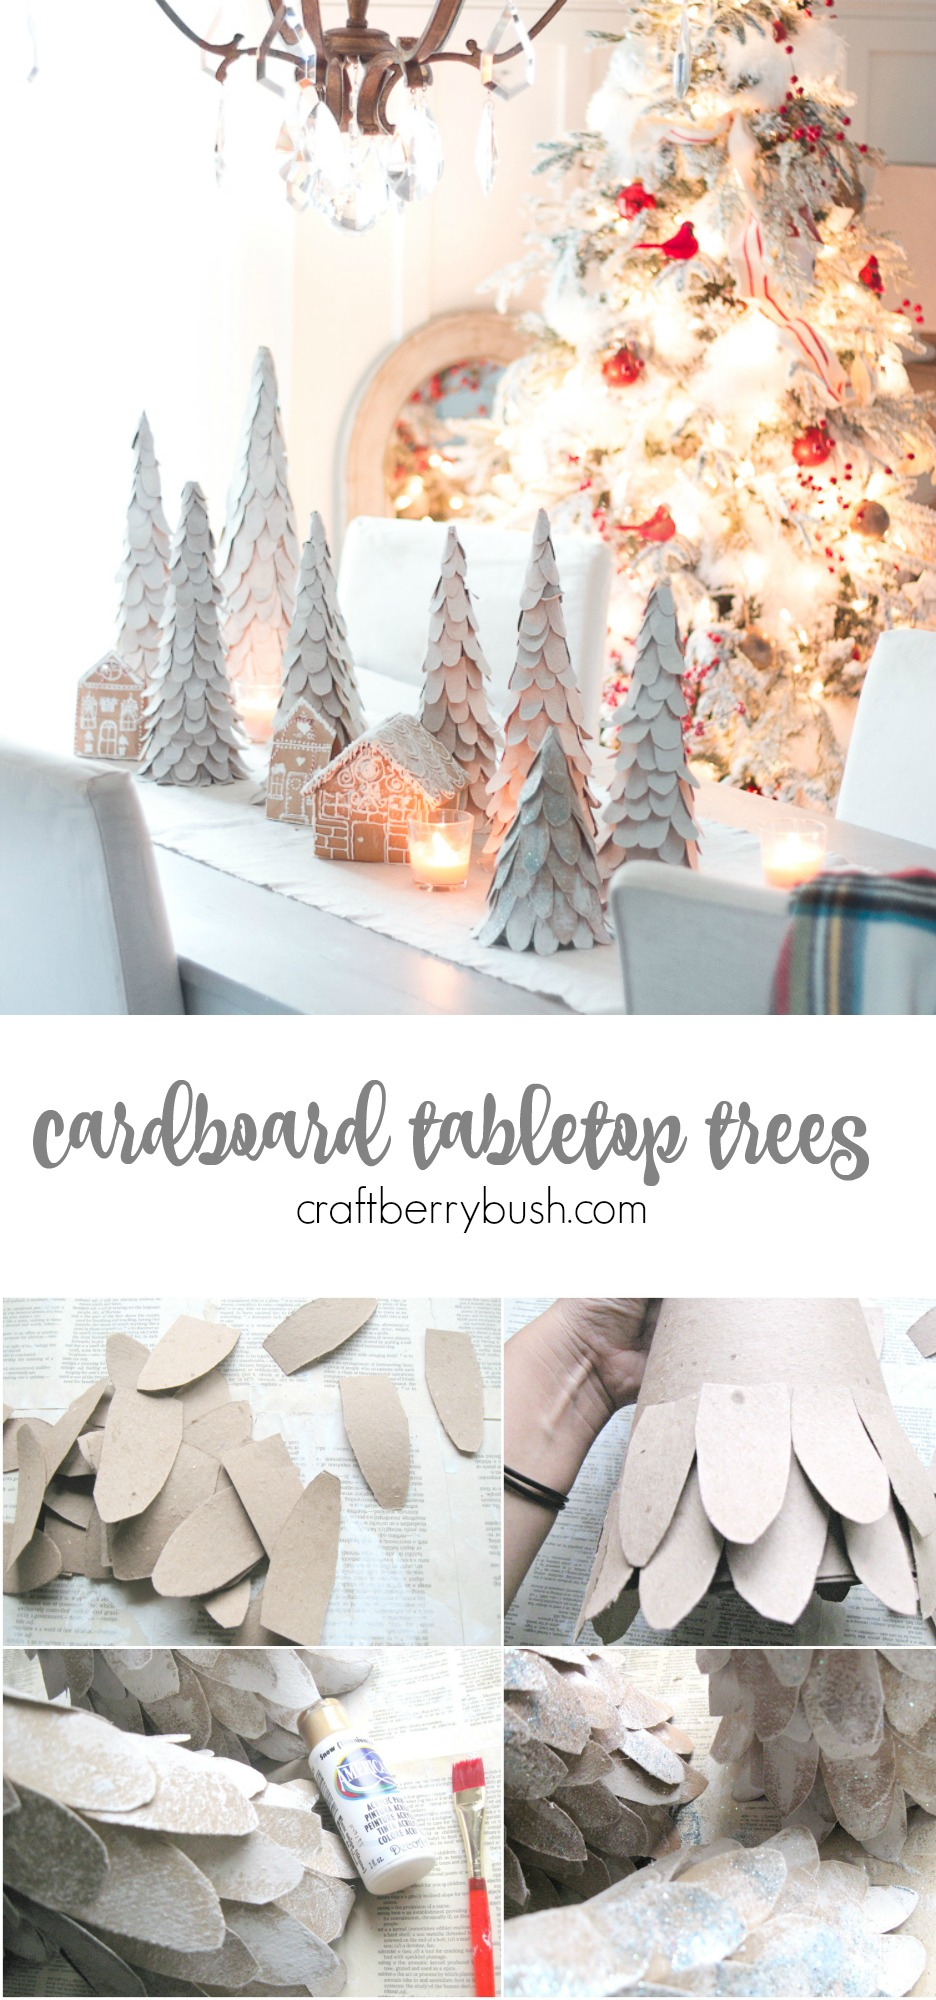 cardboardtabletoptreescraftberrybush